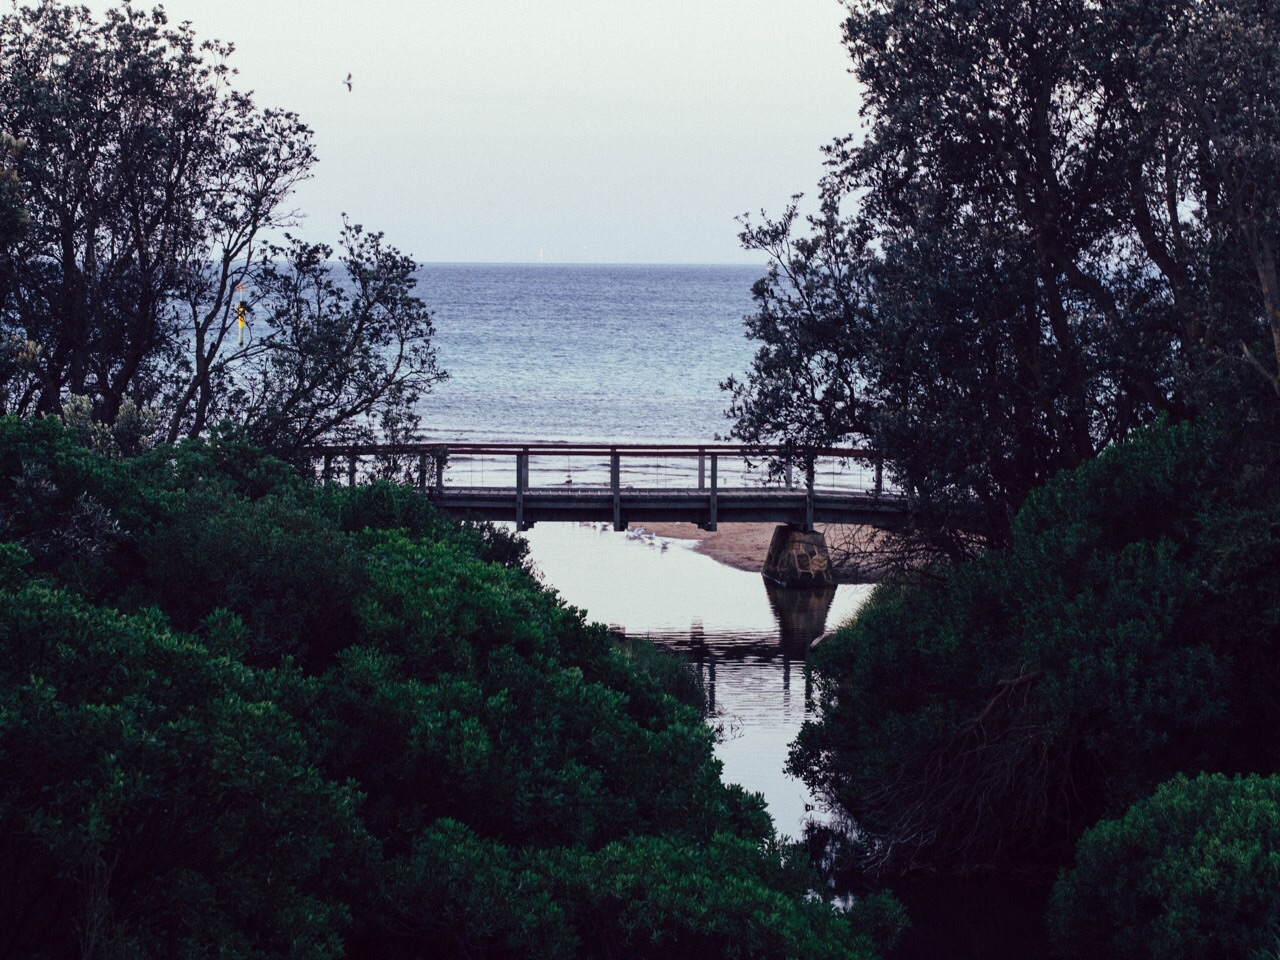 The bridge at Mills beach